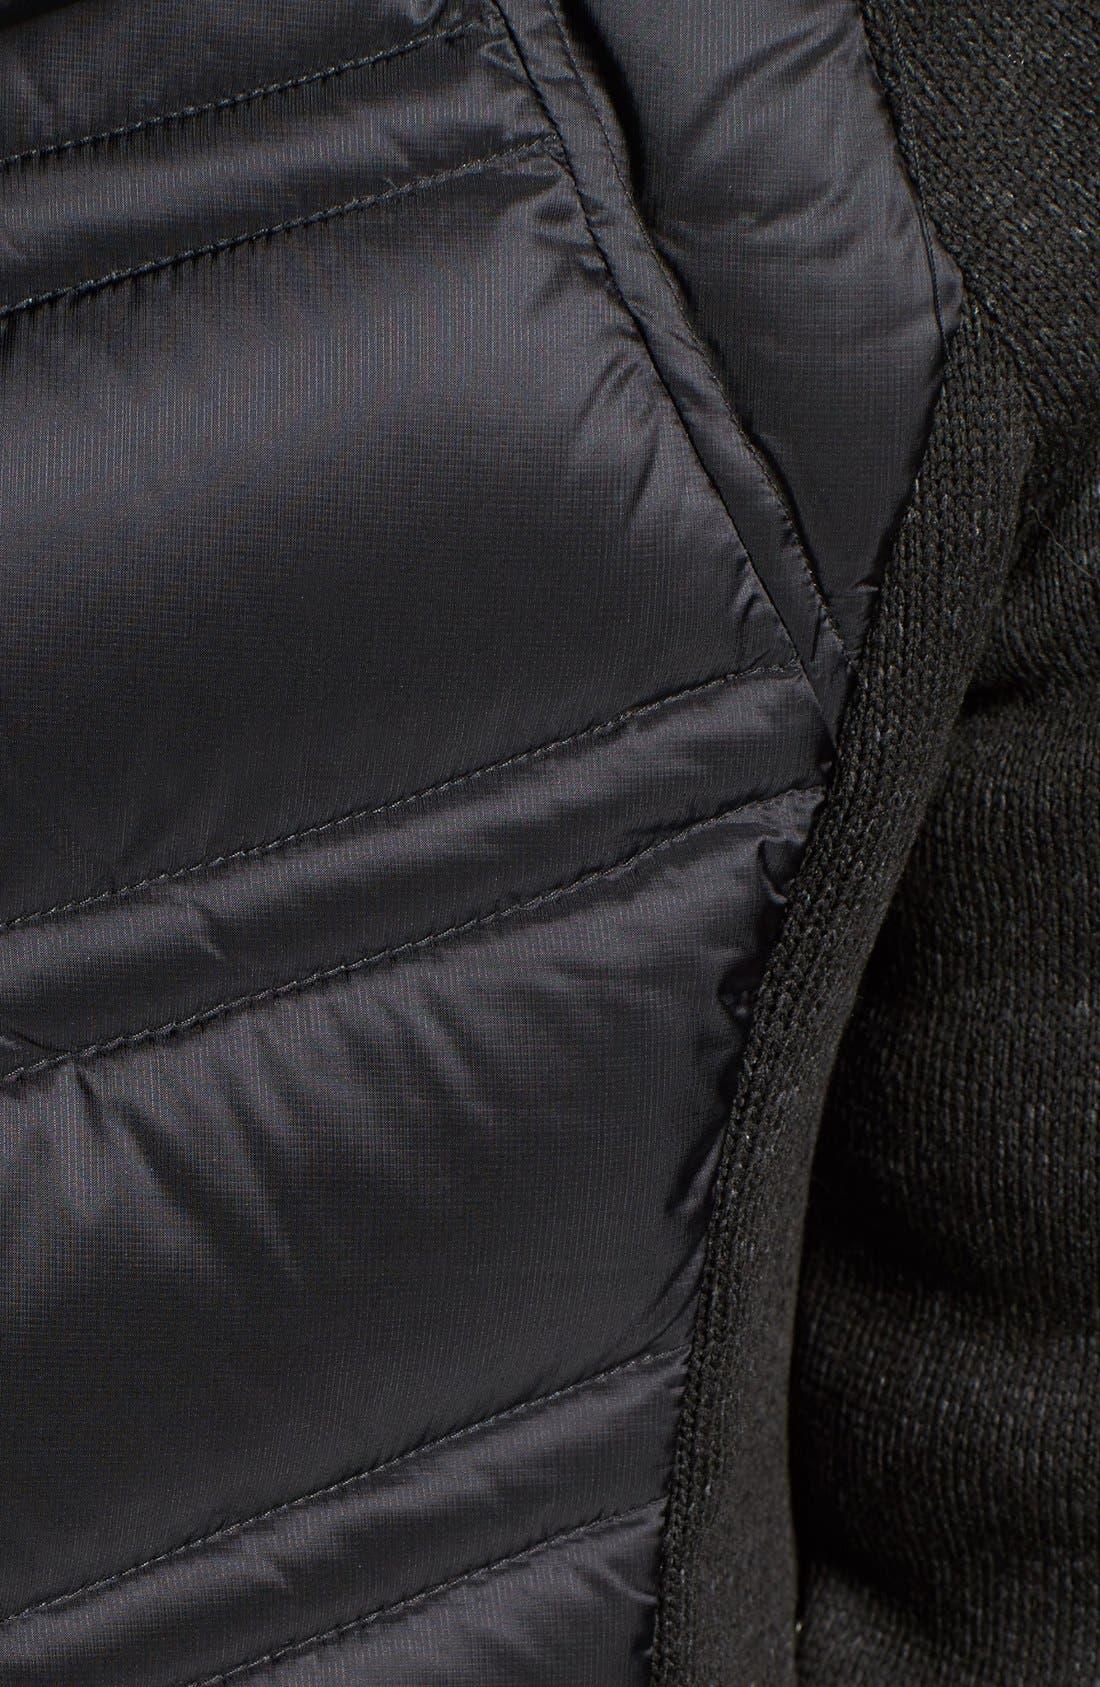 MICHAEL MICHAEL KORS,                             Mixed Media Hooded Down Jacket,                             Alternate thumbnail 5, color,                             001